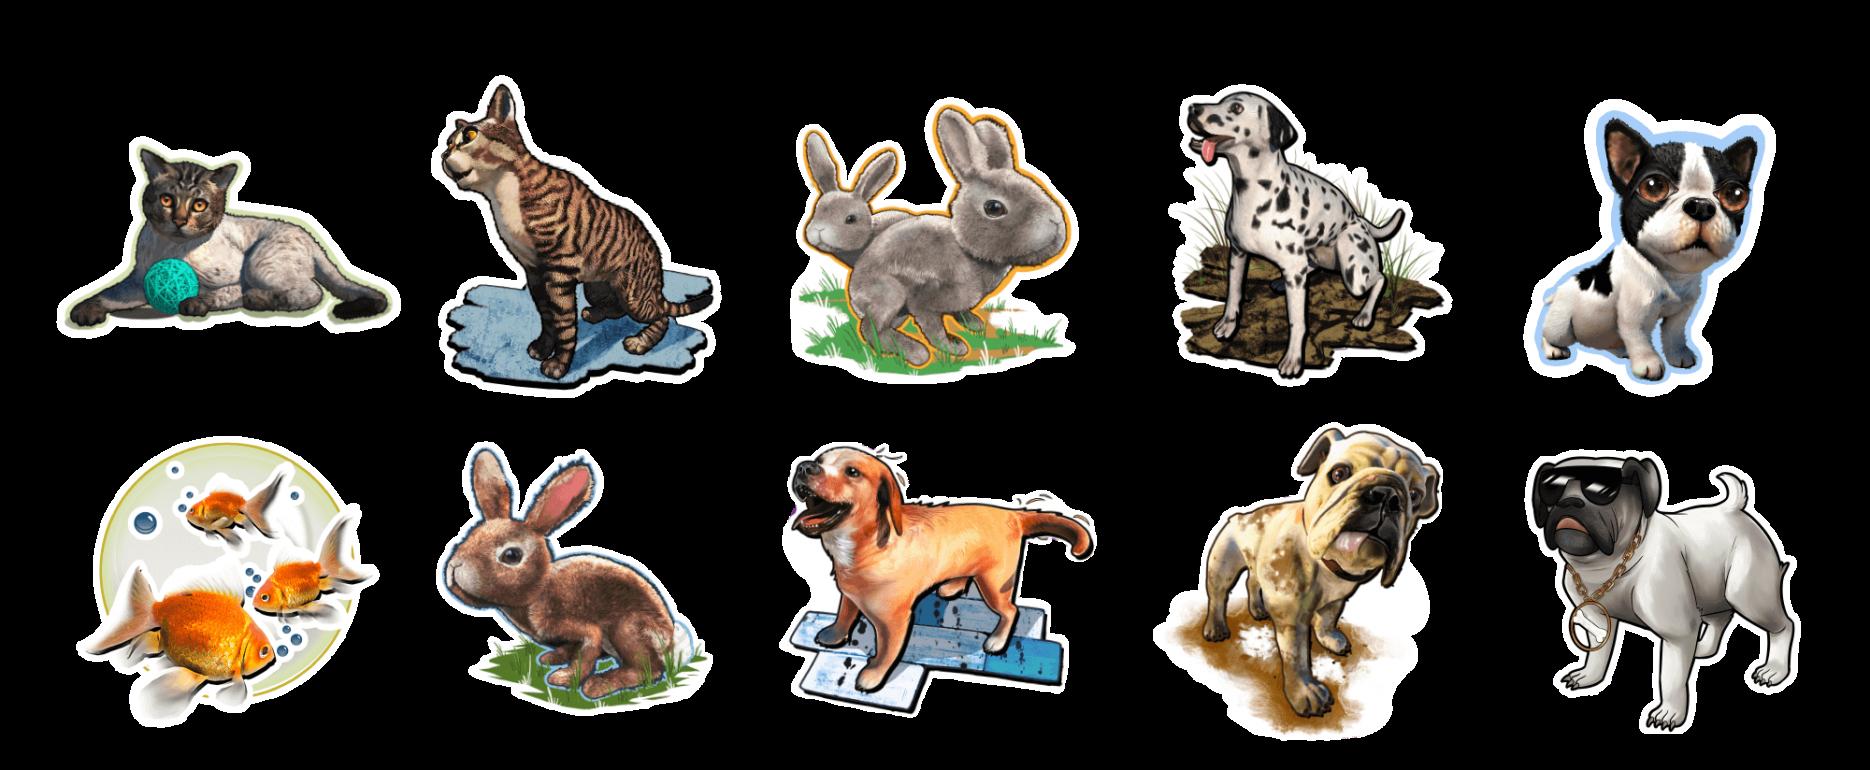 Holotoyz stickers pet party